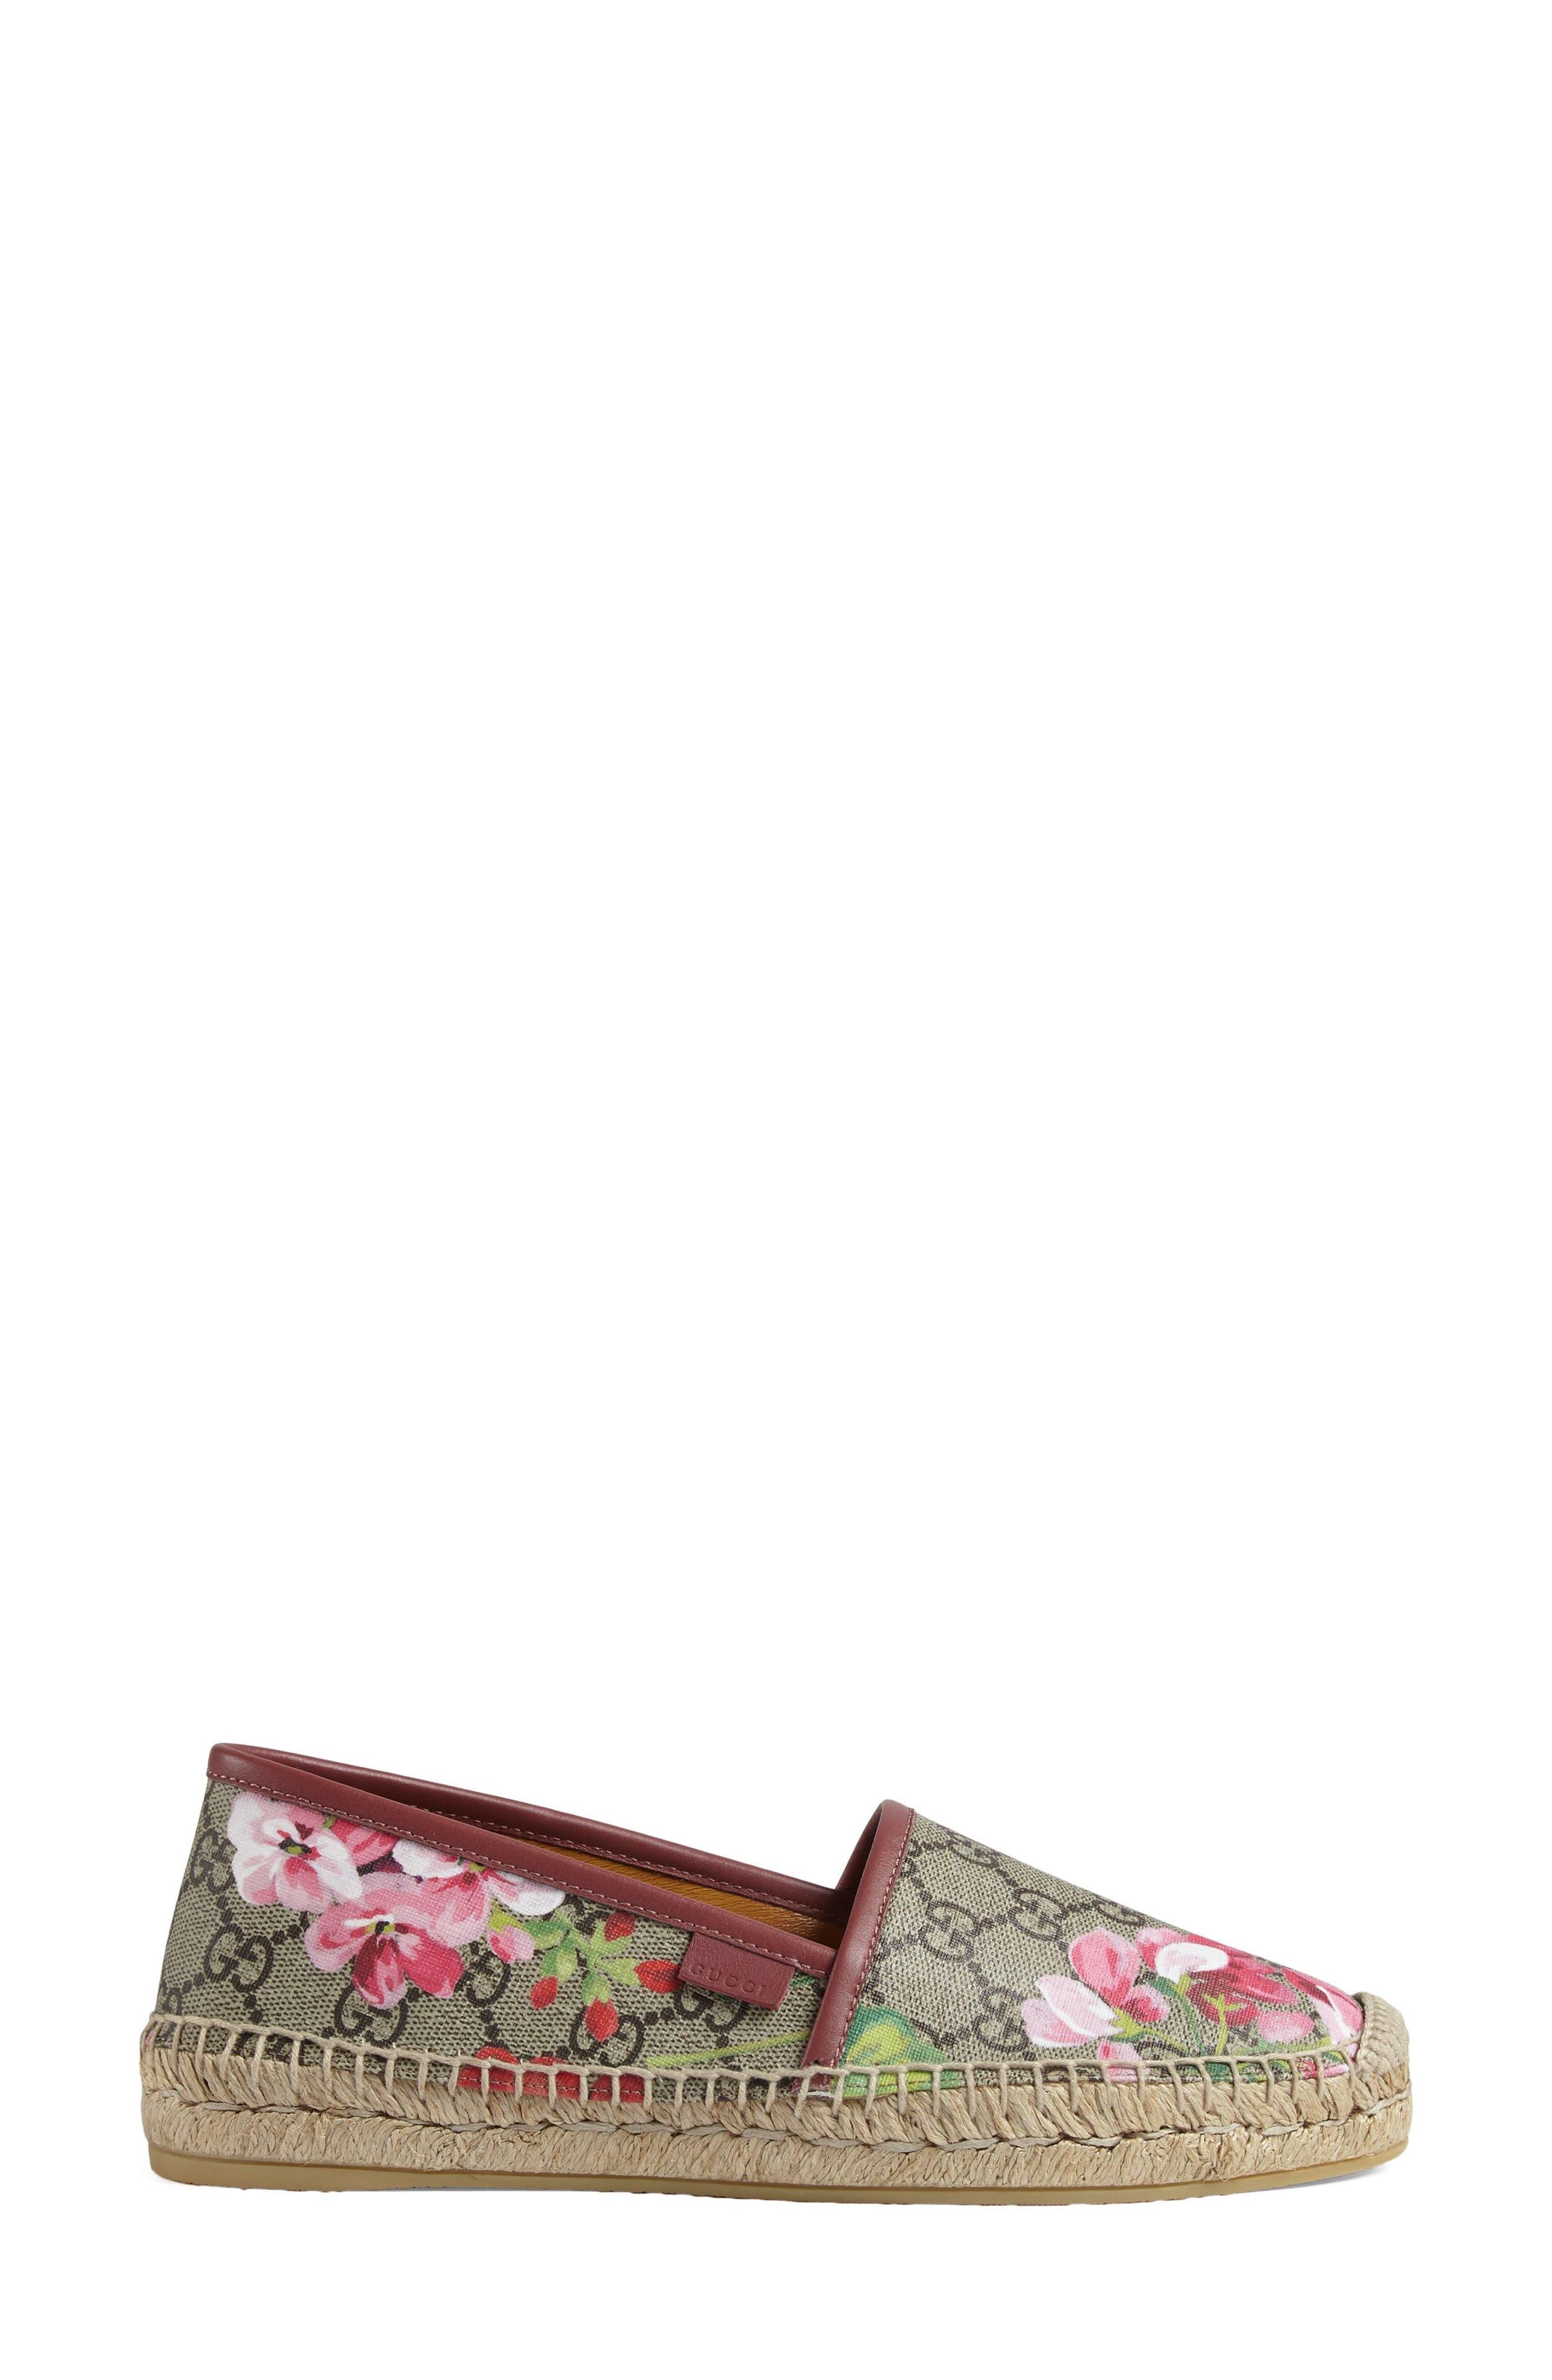 Main Image - Gucci 'Pilar' Espadrille Slip-On Flat (Women)